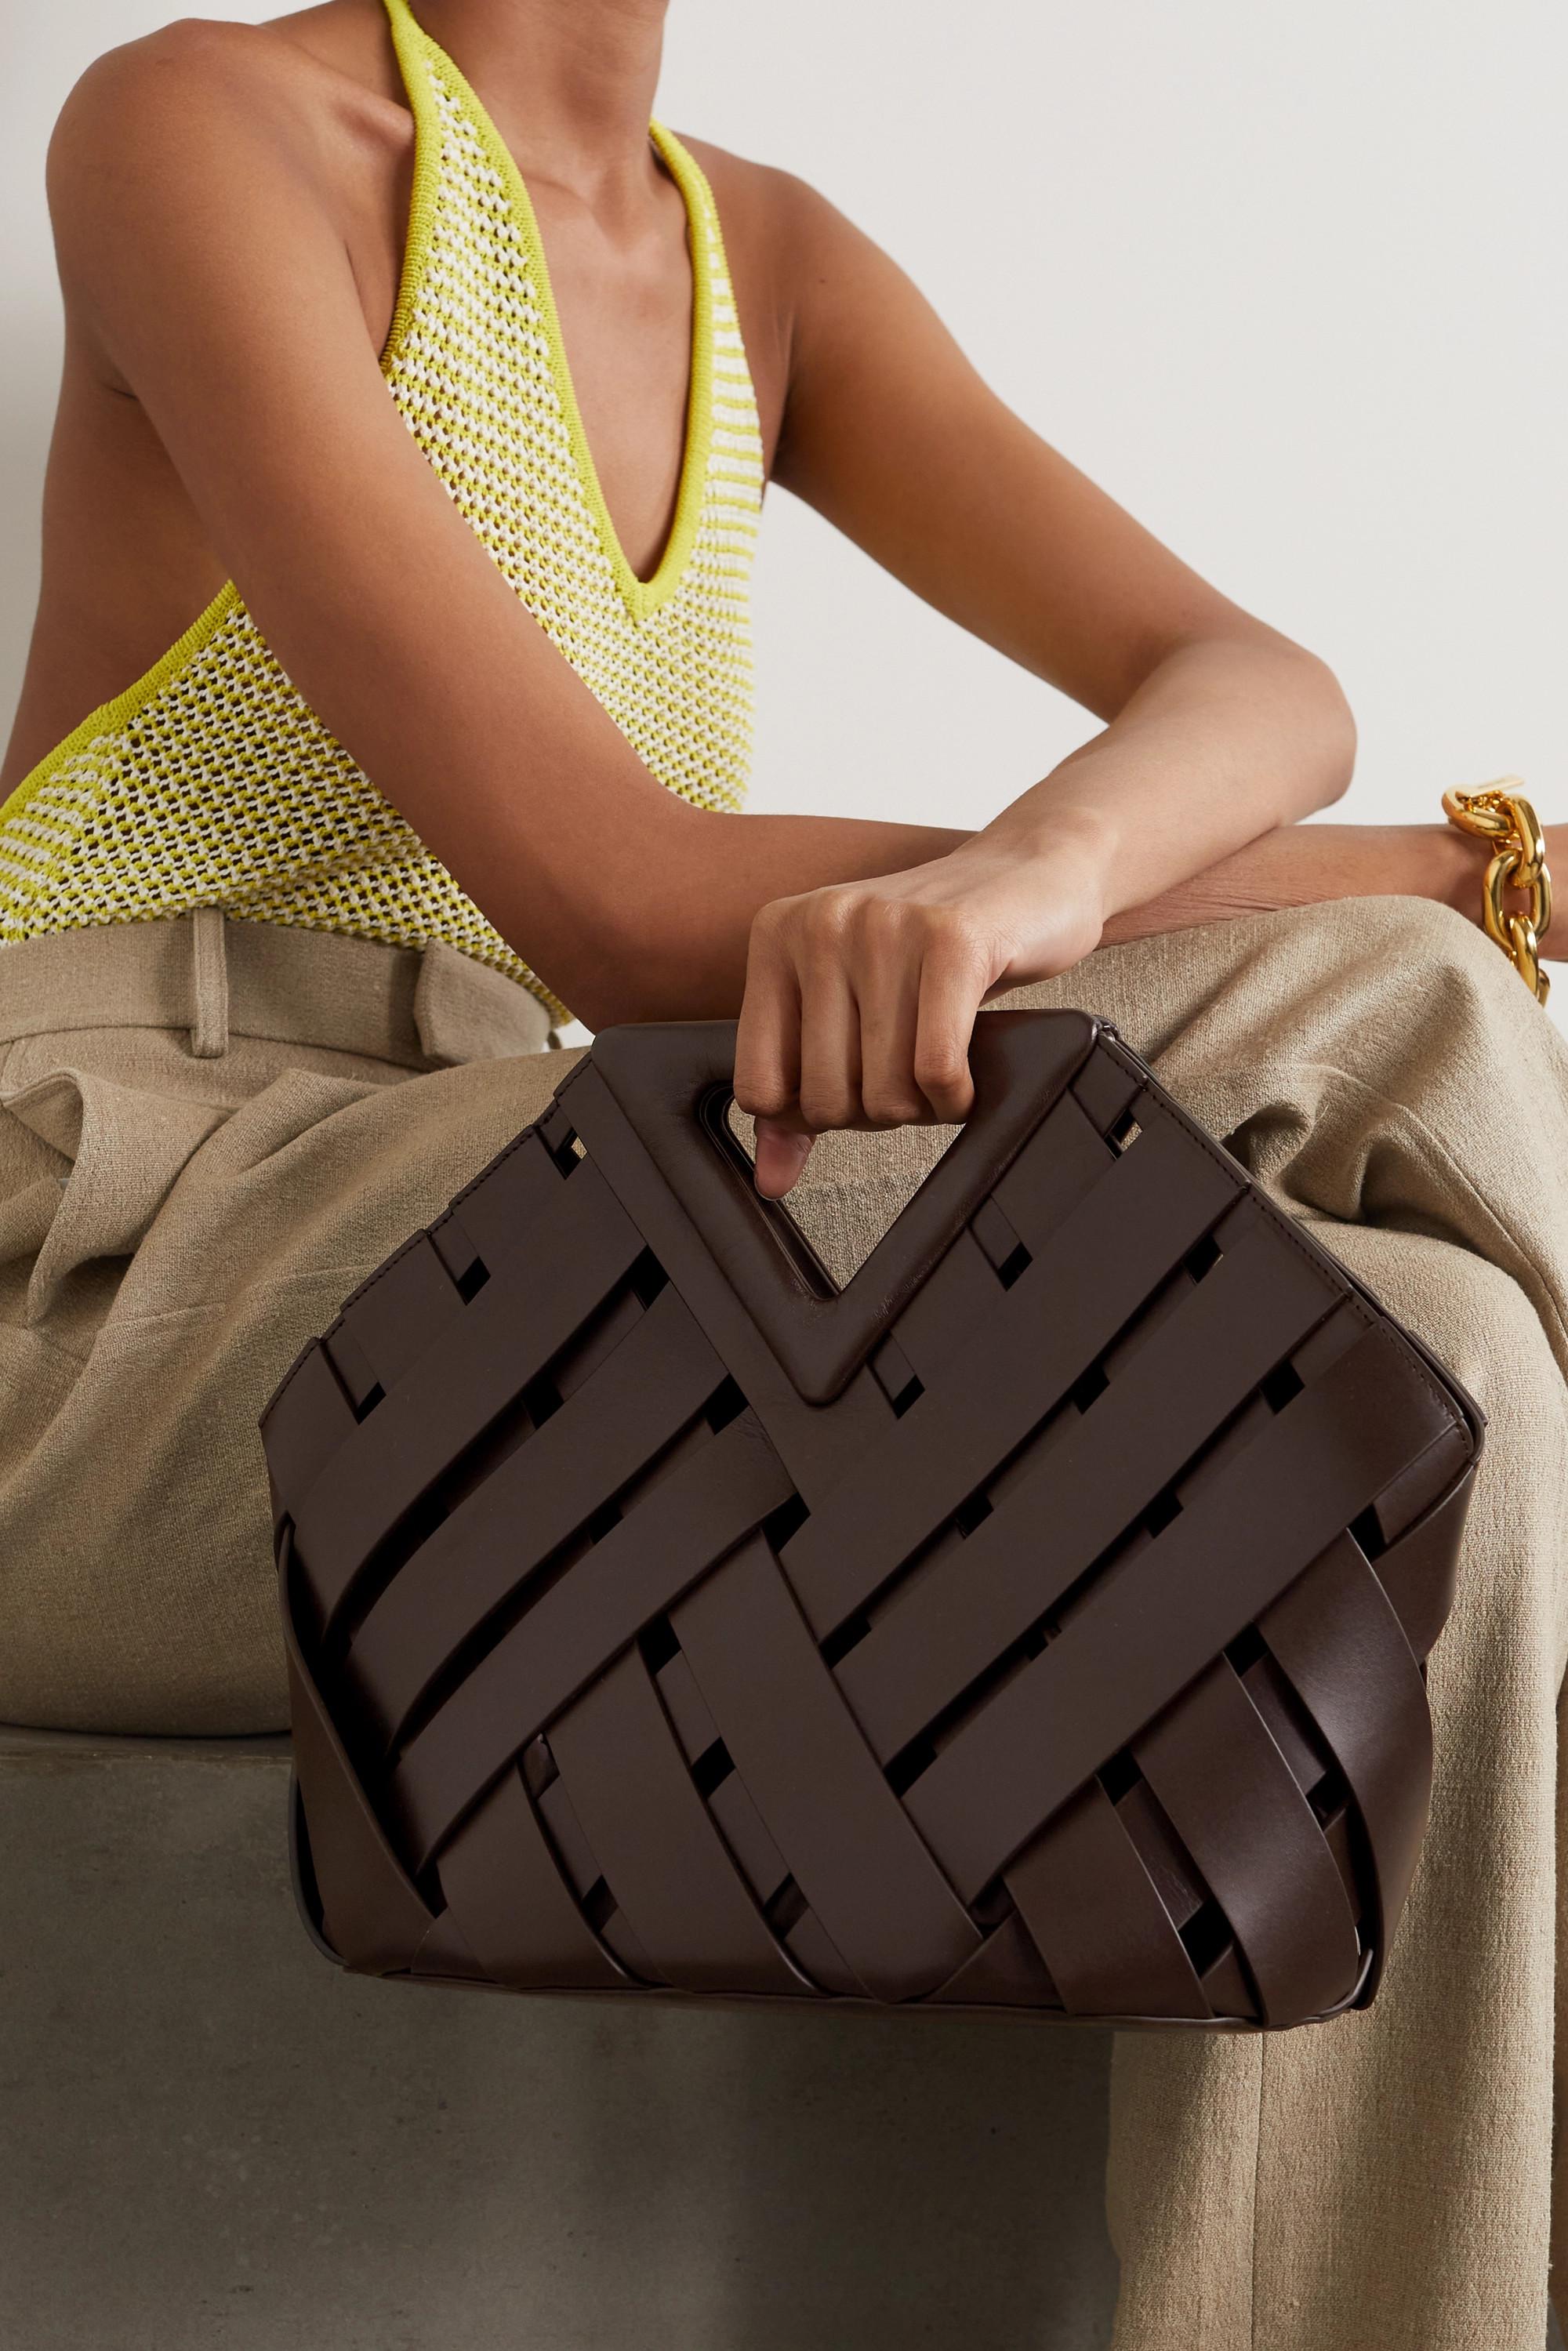 Bottega Veneta Sac à main en cuir intrecciato Point Basket